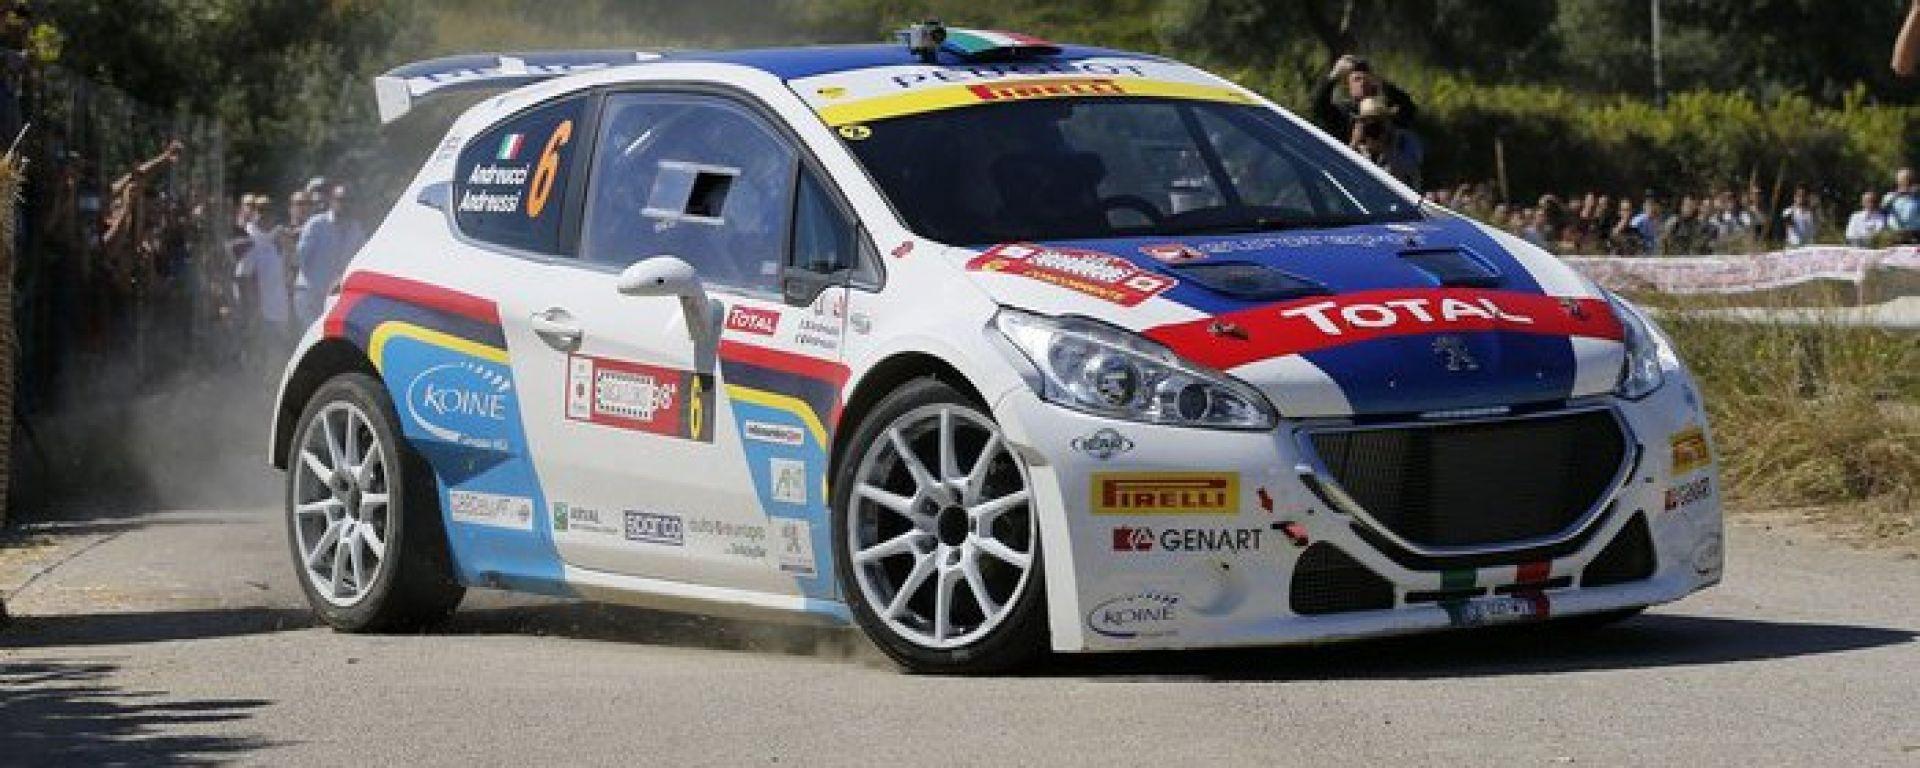 Rally Targa Florio: al via l'edizione del centenario